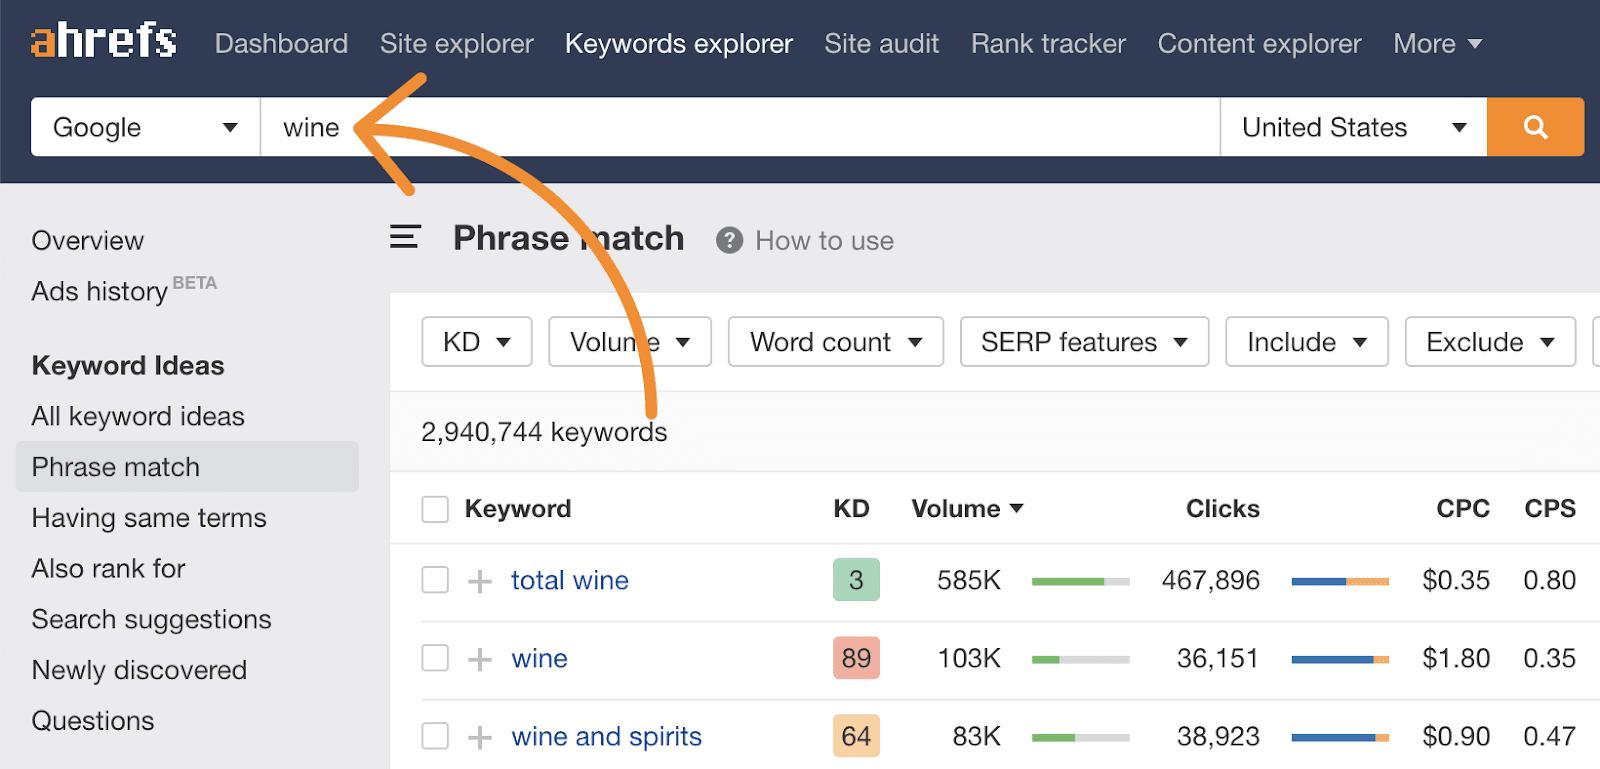 5 keywords explorer search hub page topic 1